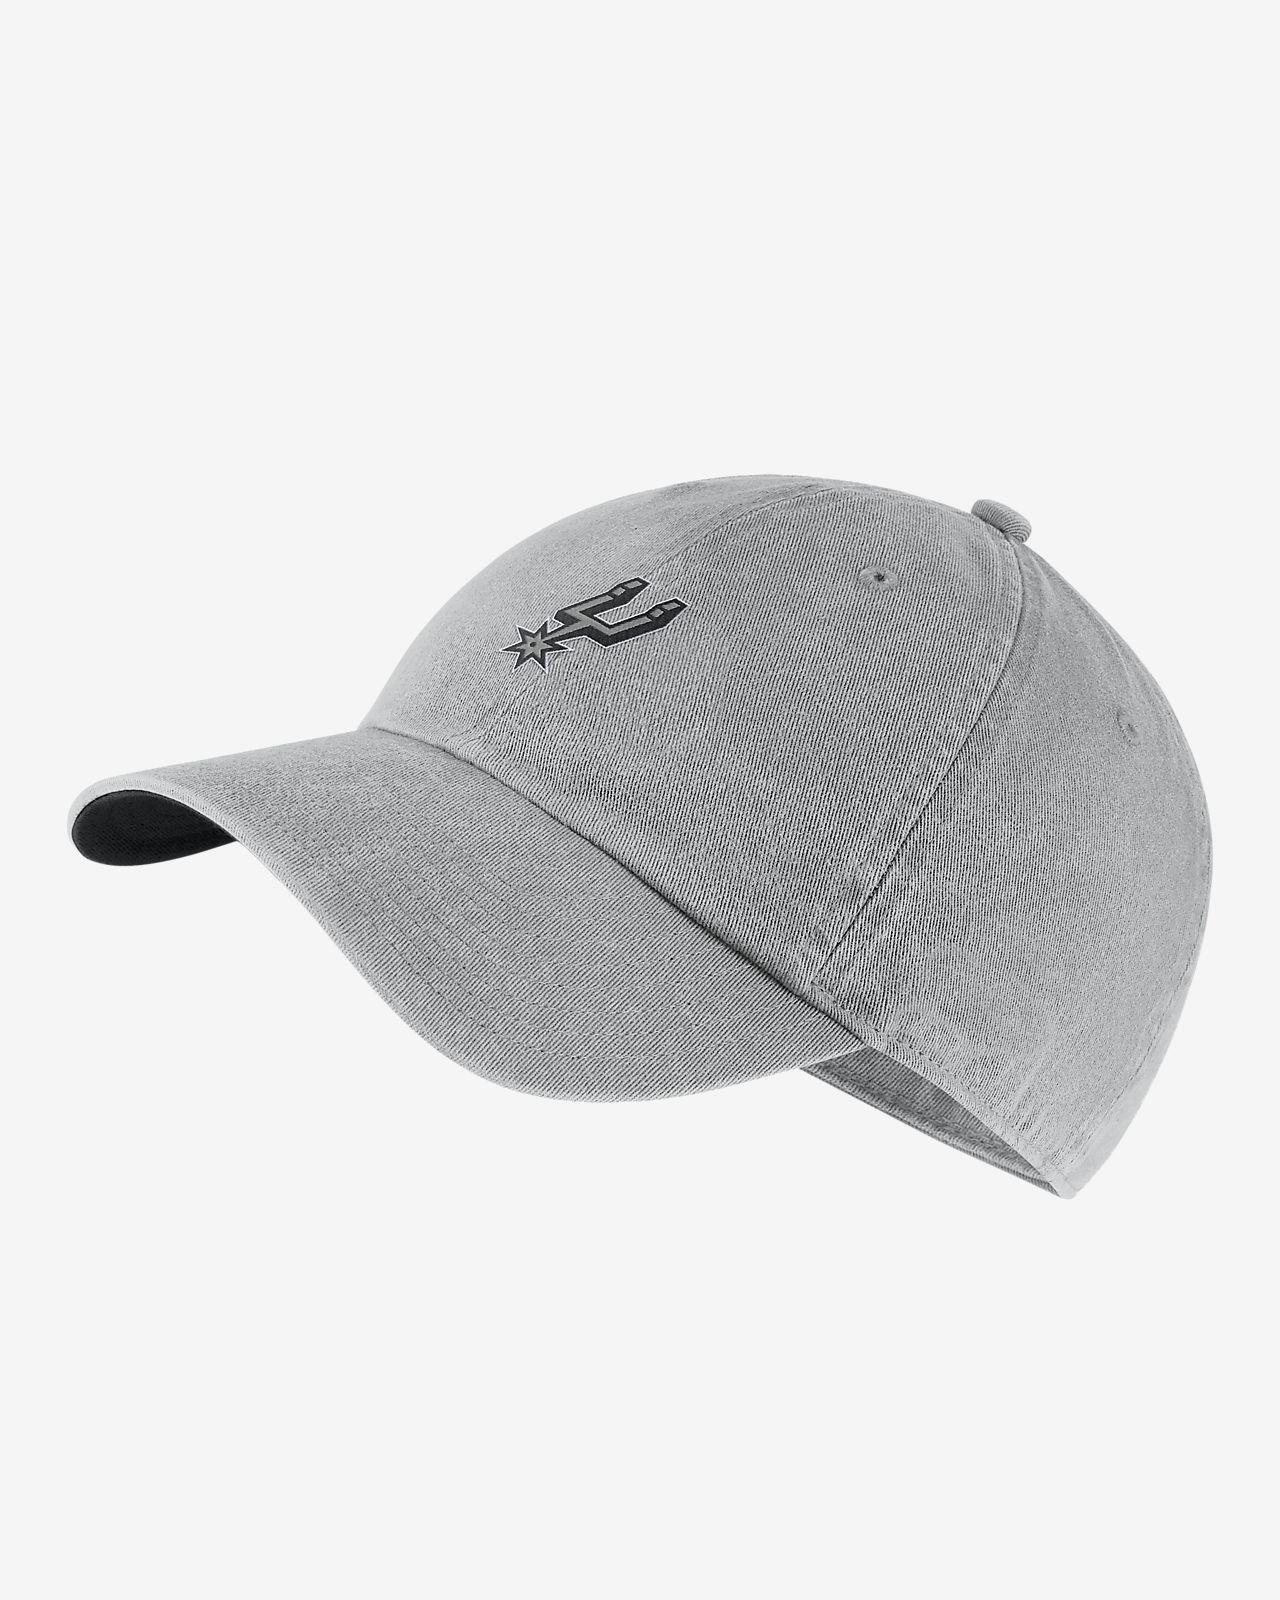 e9241329223 San Antonio Spurs Nike Heritage86 NBA Hat. Nike.com